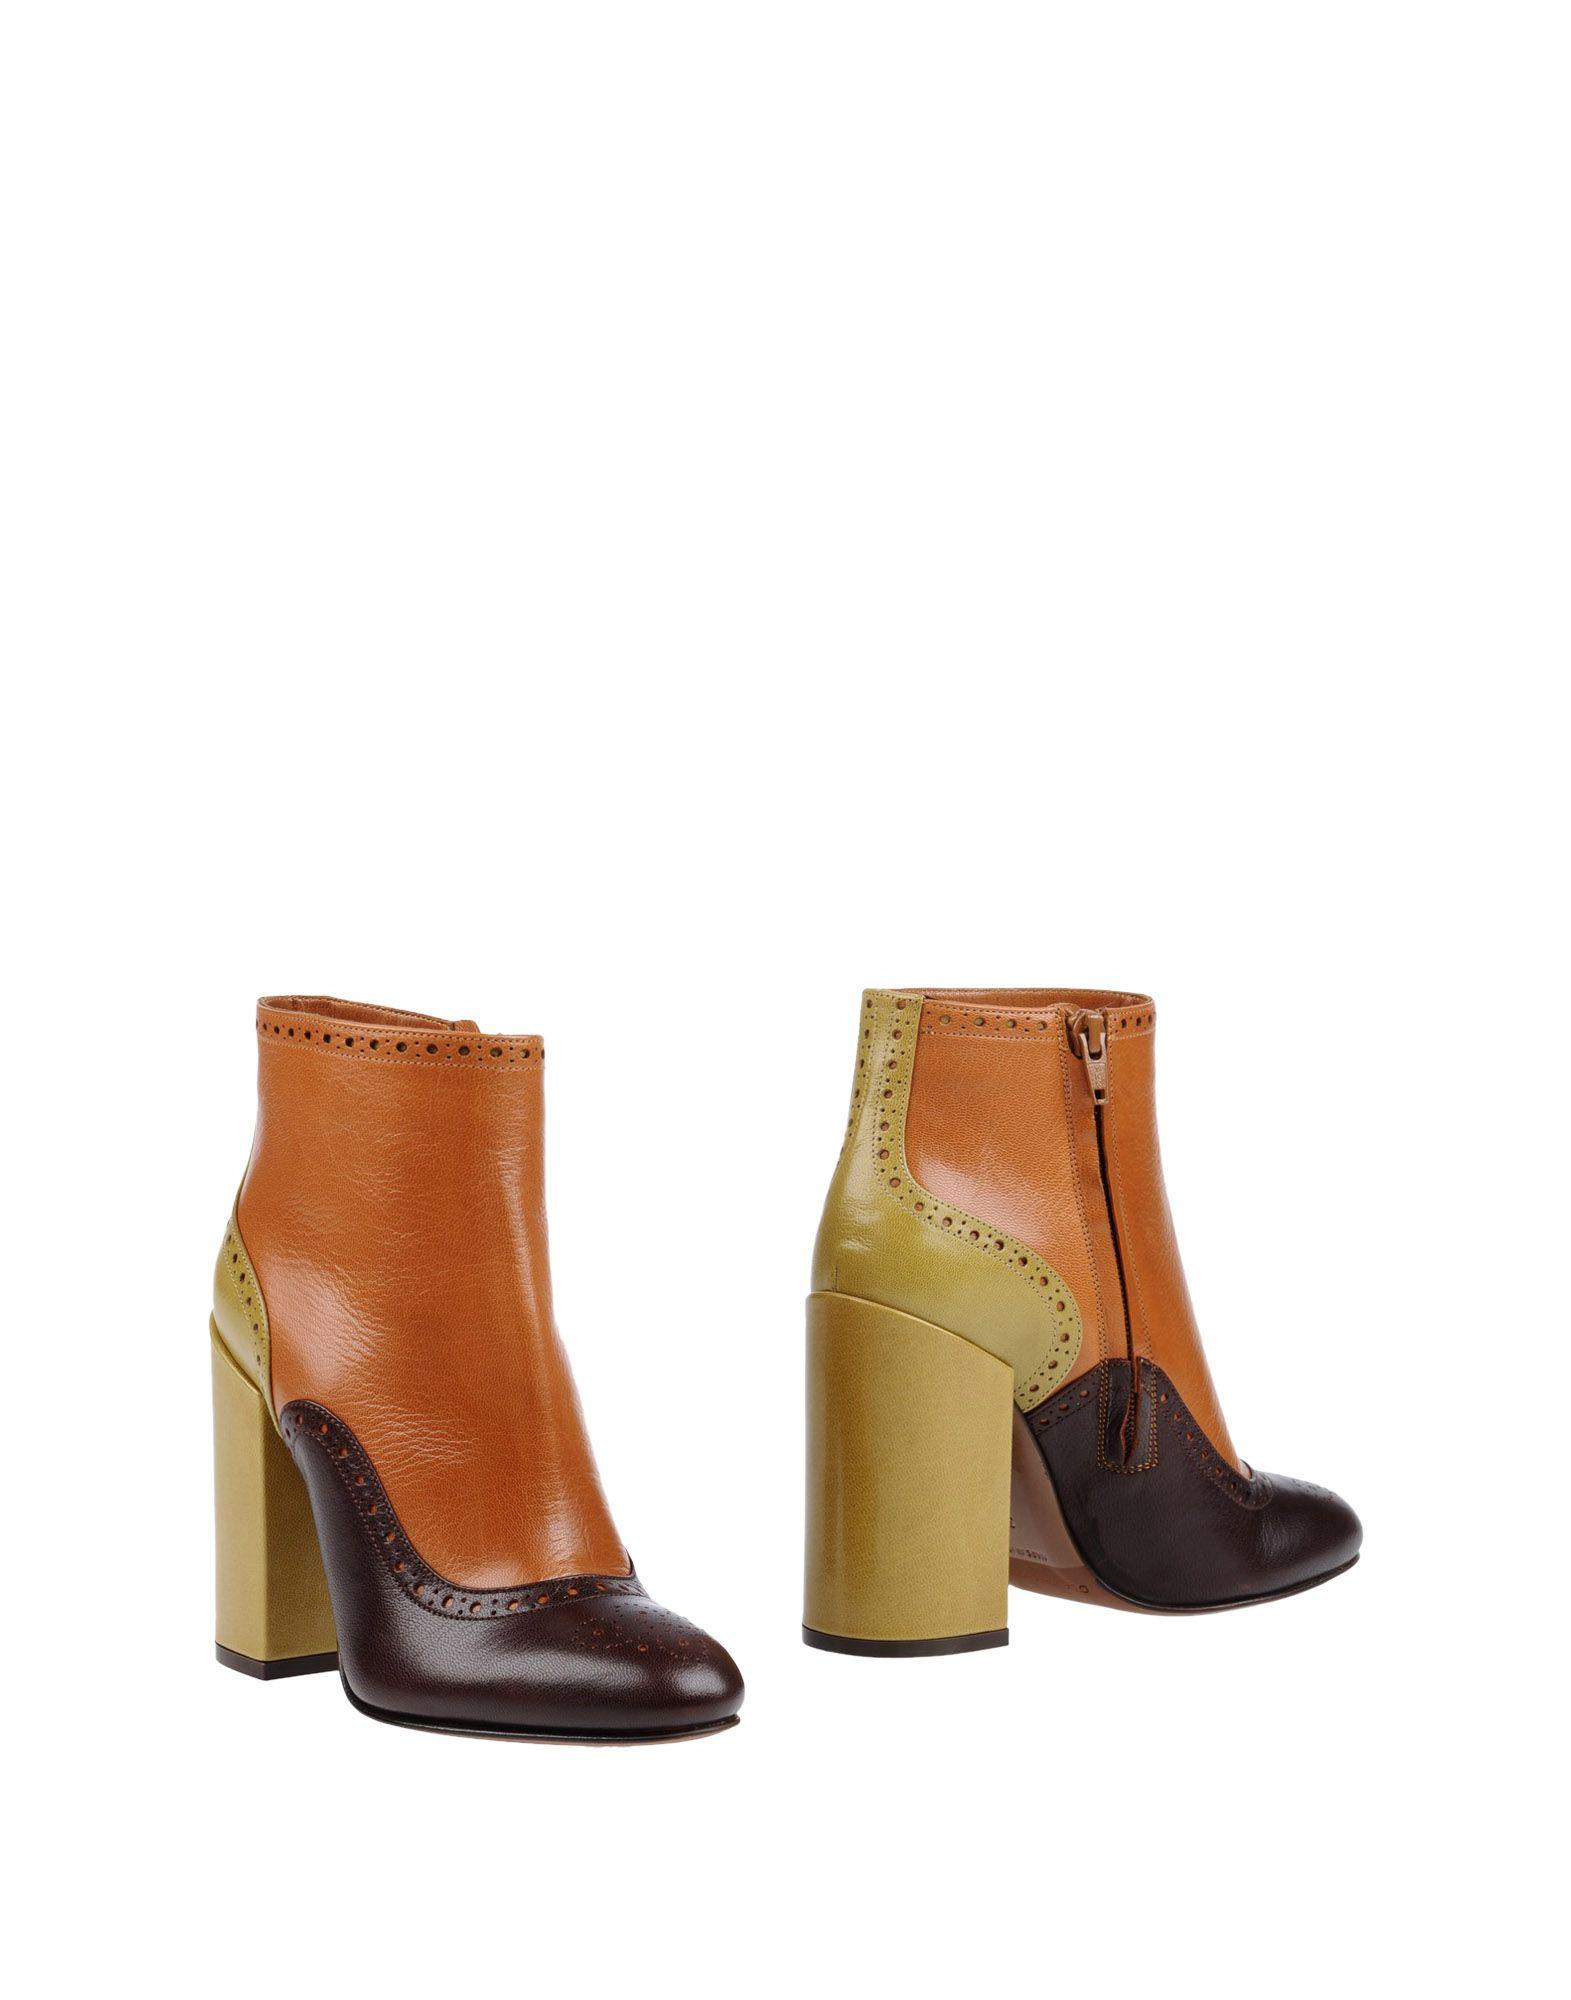 Rabatt Chose Schuhe L' Autre Chose Rabatt Stiefelette Damen  11256340AS 6c7bb2